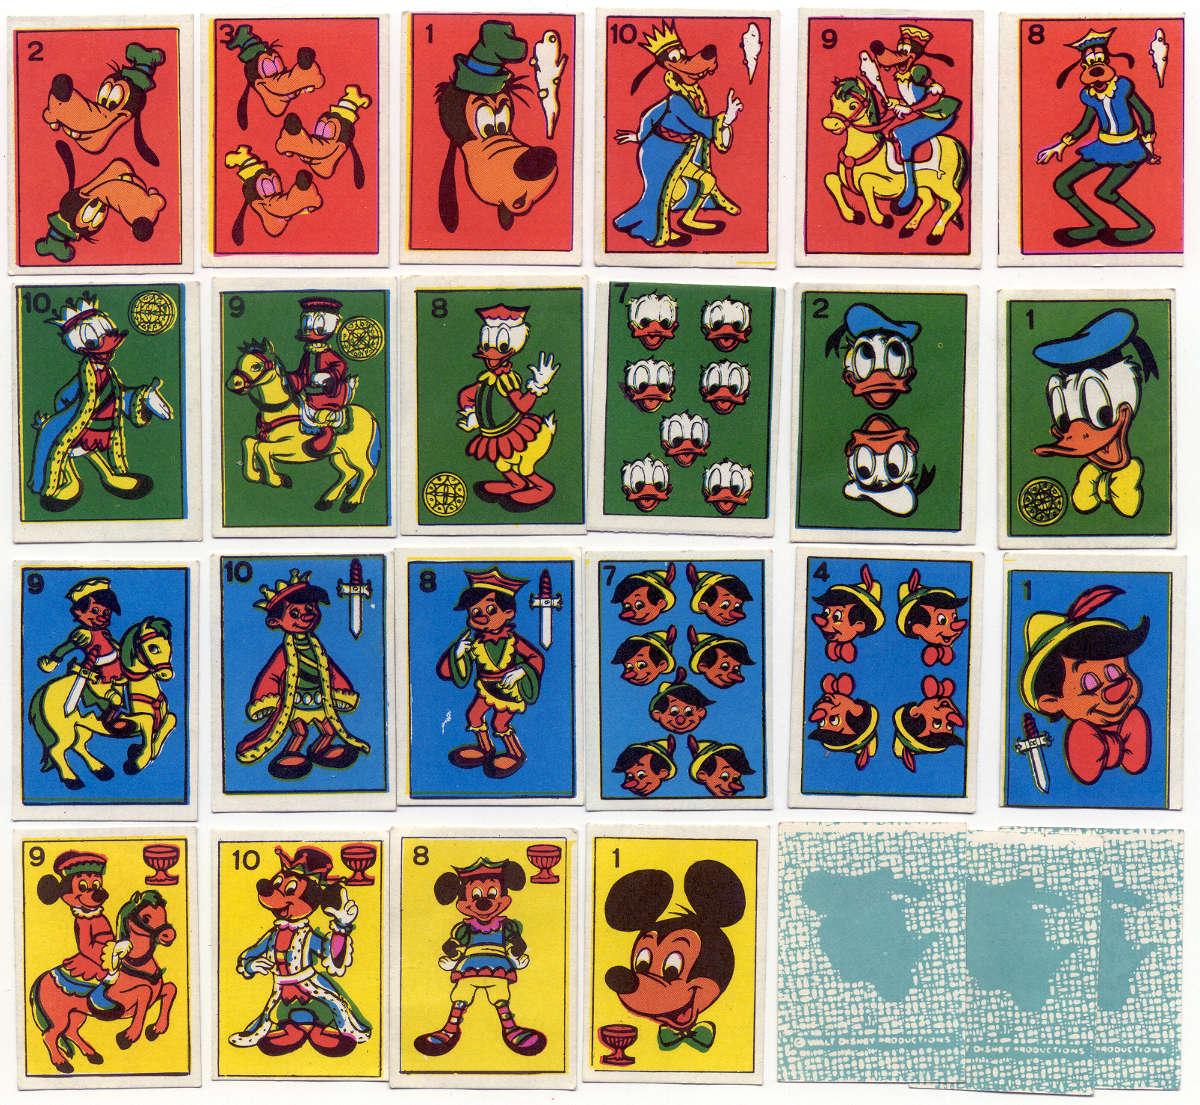 Children's miniature Walt Disney playing cards, Uruguay, c.1990